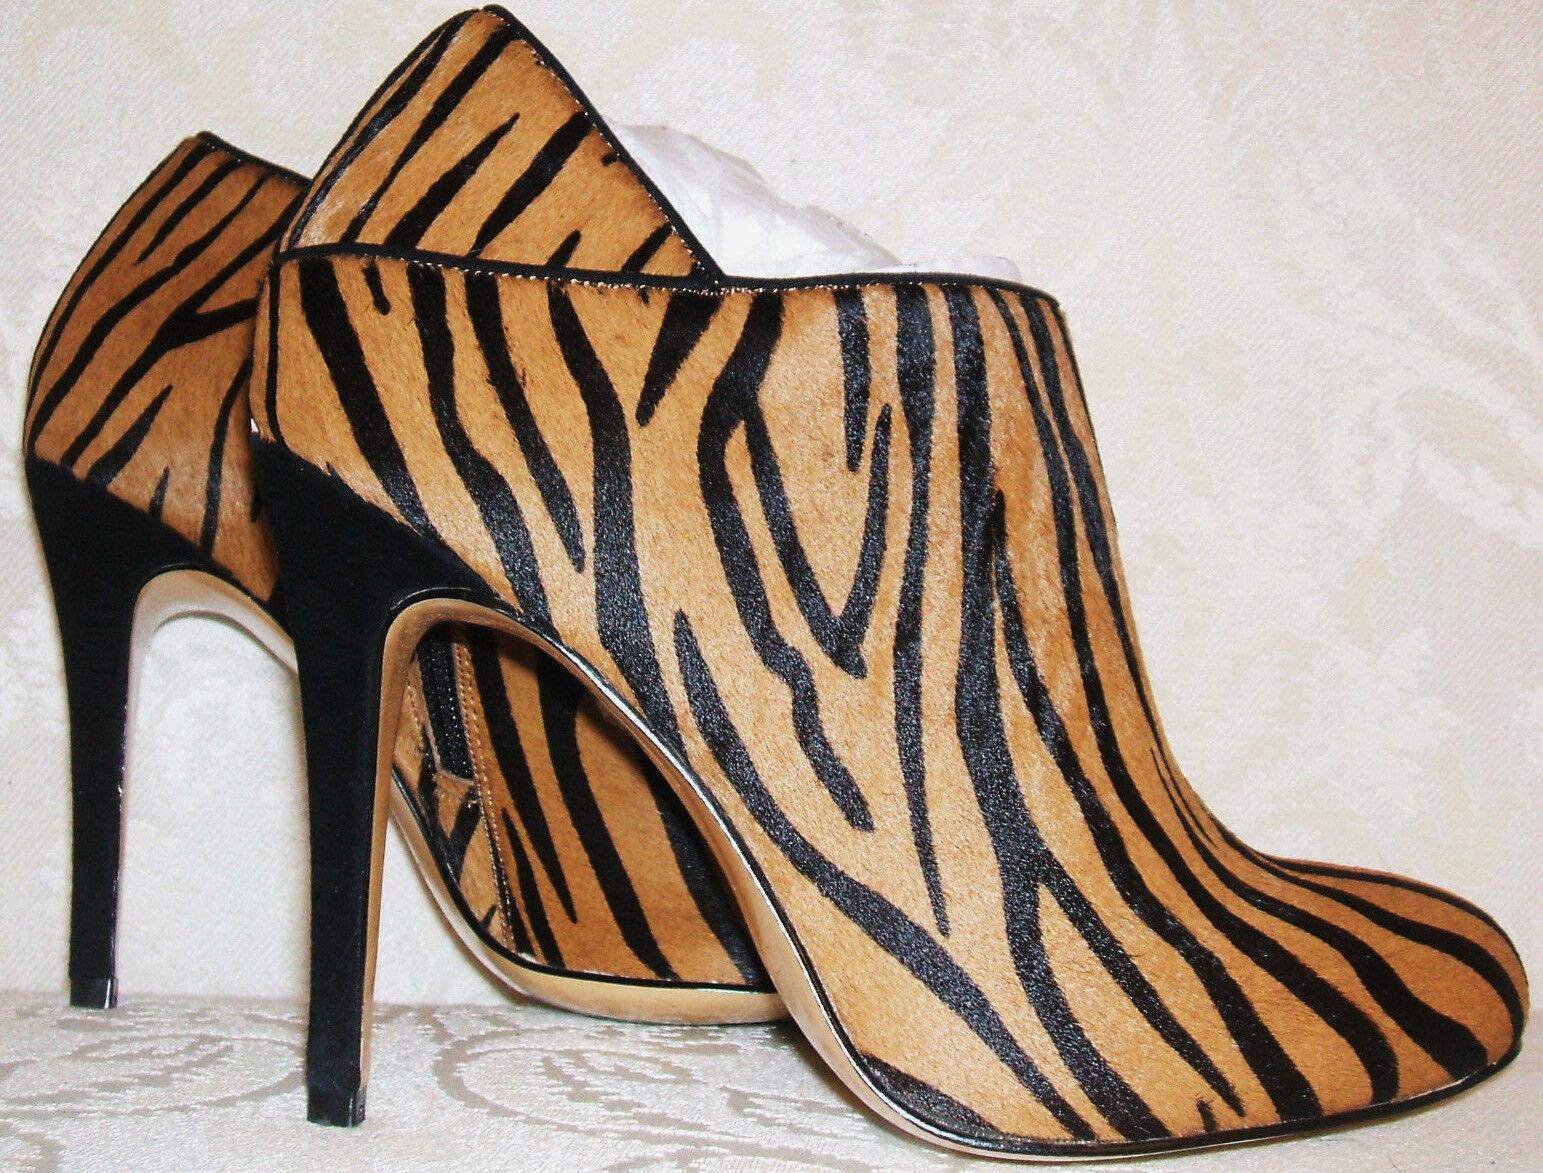 PVP  Nuevo Dune Talle 3 - 6 Tigre Tigre Tigre Leopardo Pony Piel Pelo Napoli Botines Zapatos  Felices compras